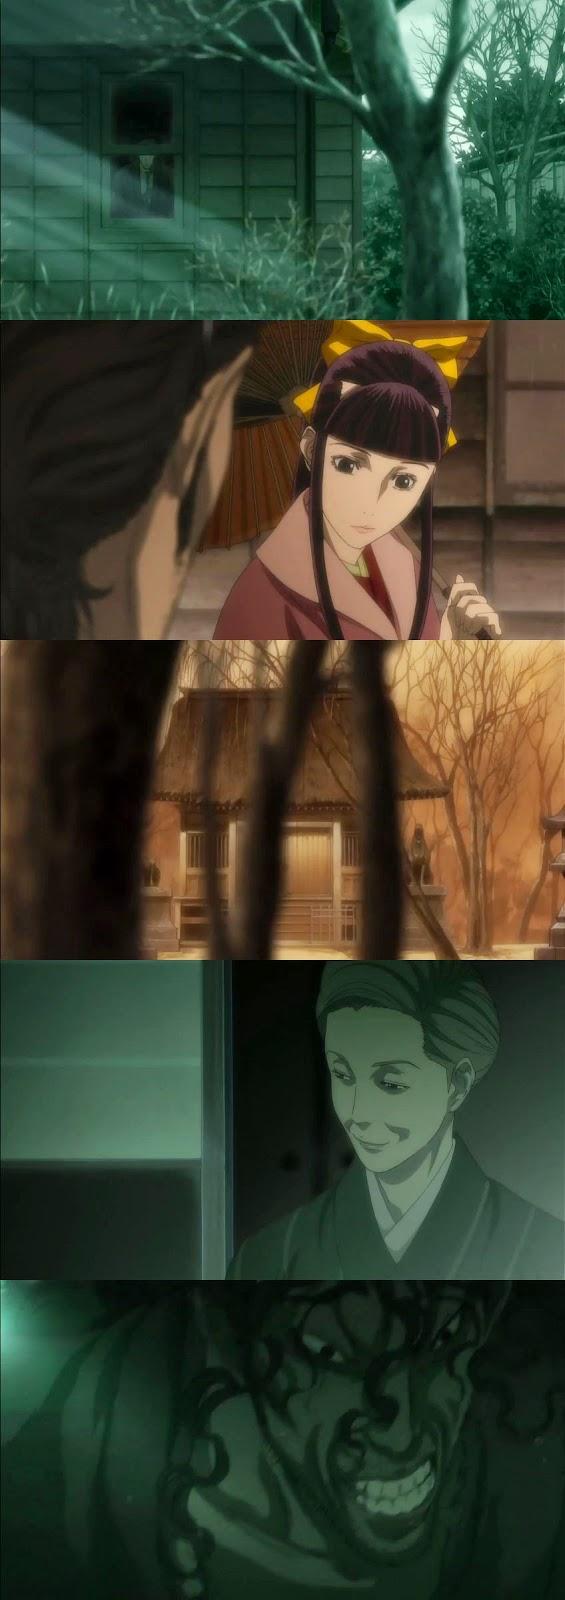 Aoi-Bungaku-Series-Anime-Completo-Captur